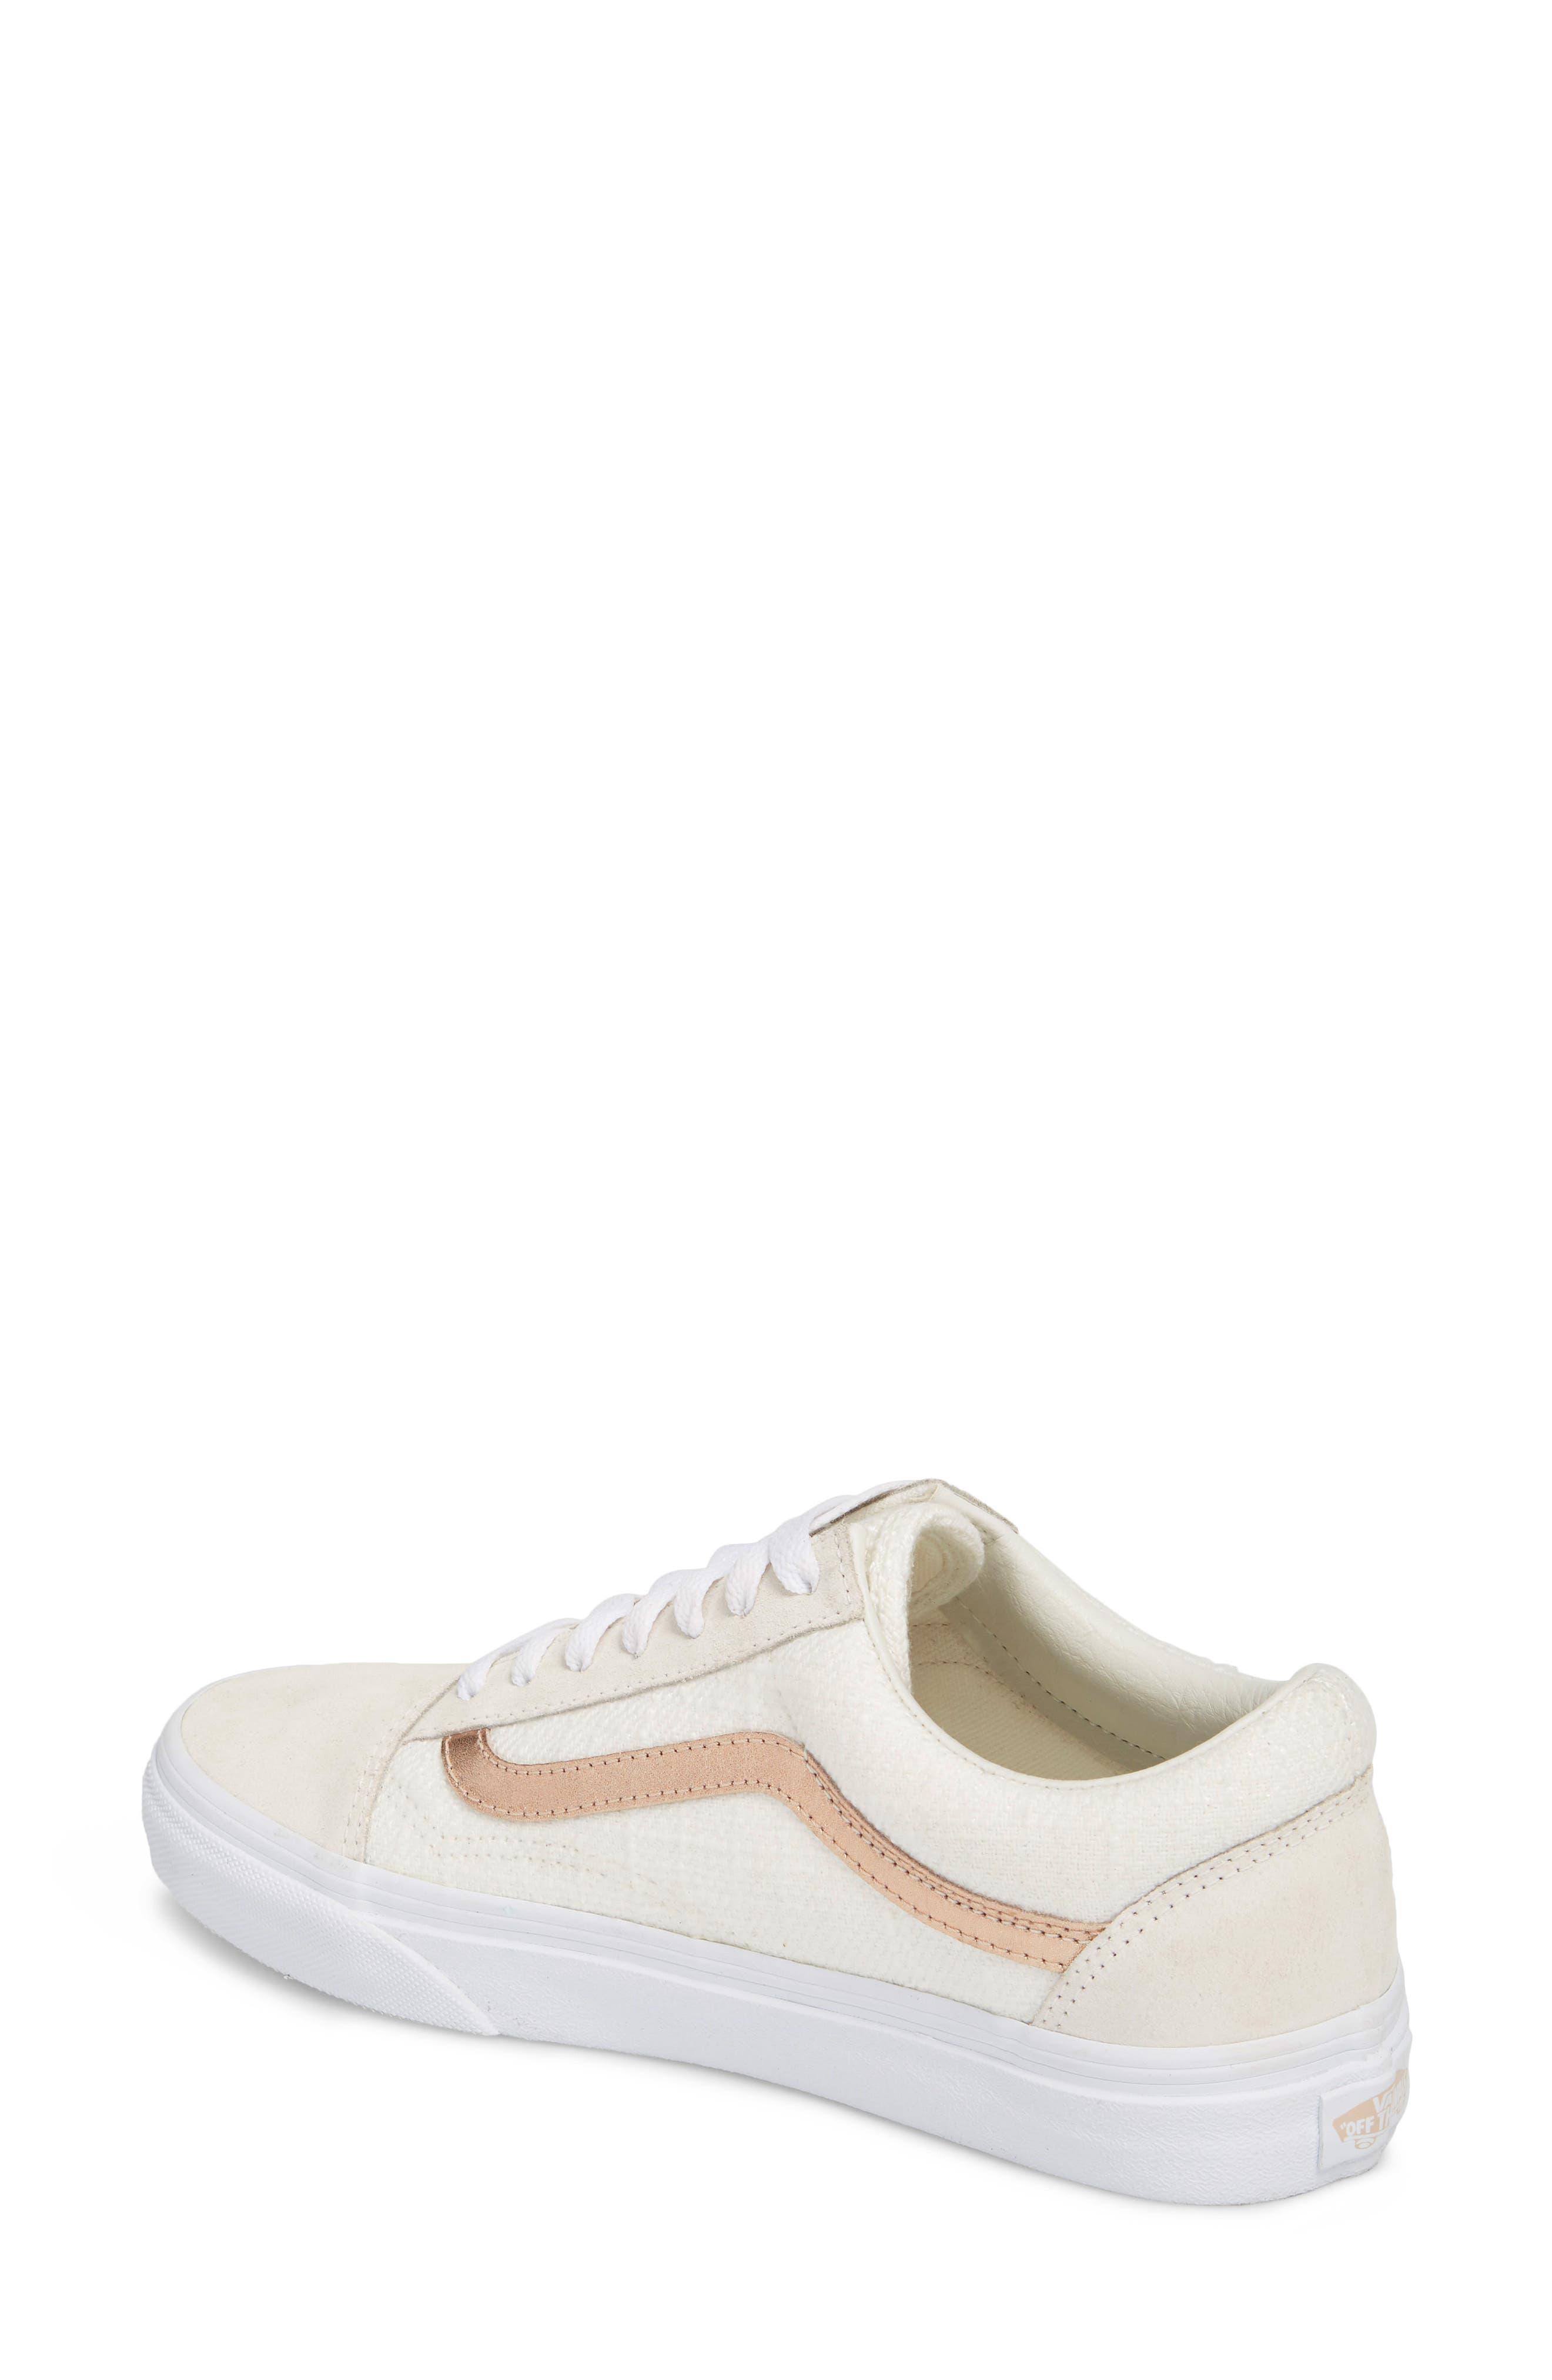 Old Skool Sneaker,                             Alternate thumbnail 3, color,                             Blanc De Blanc/ Rose Gold